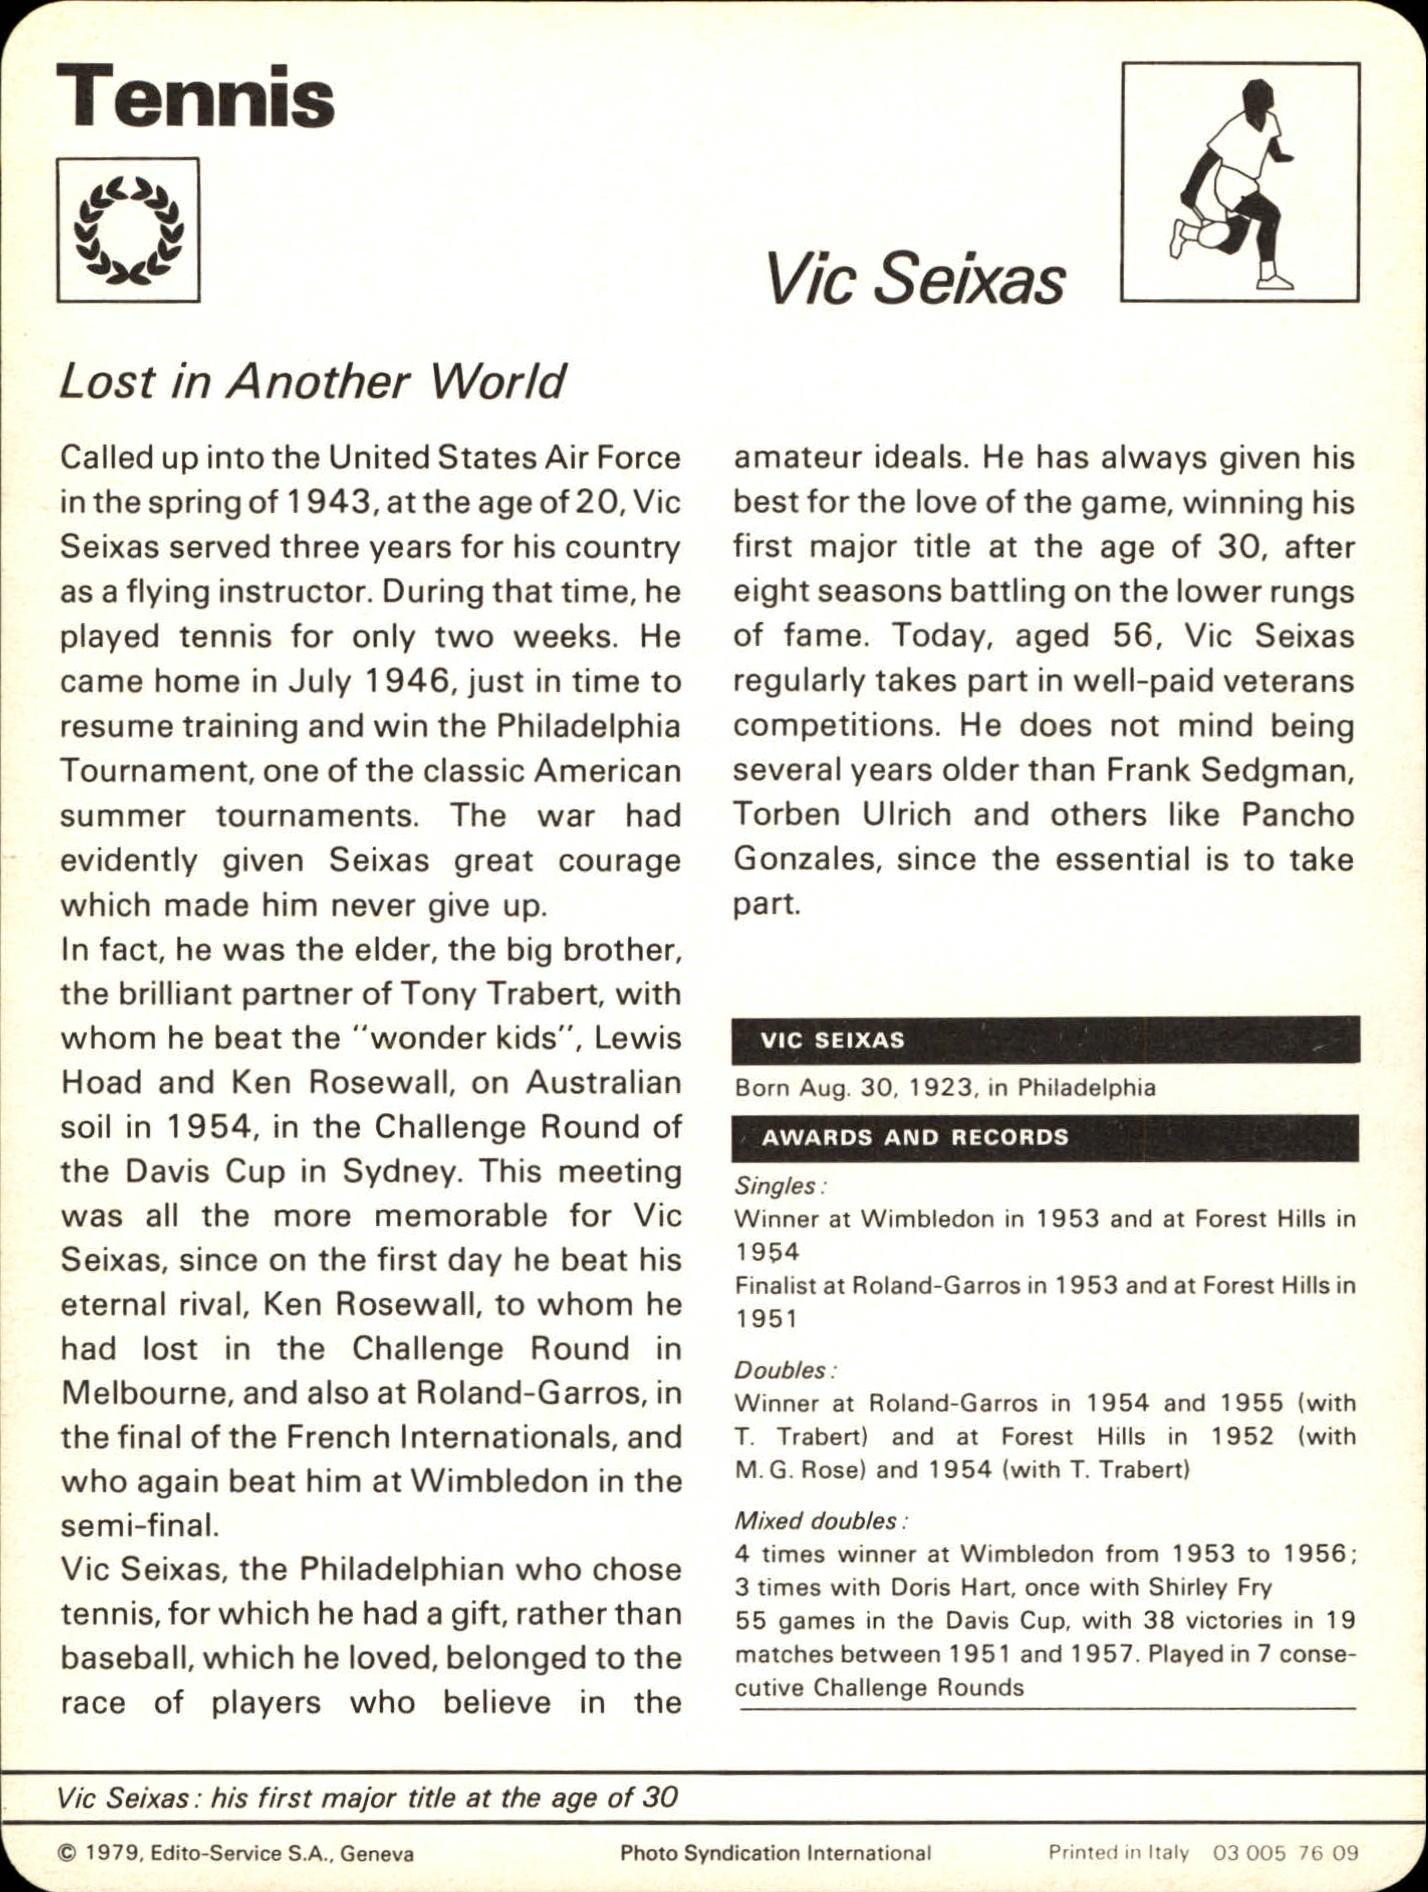 1977 79 Sportscaster Series 76 7609 Vic Seixas Oversized NM MT